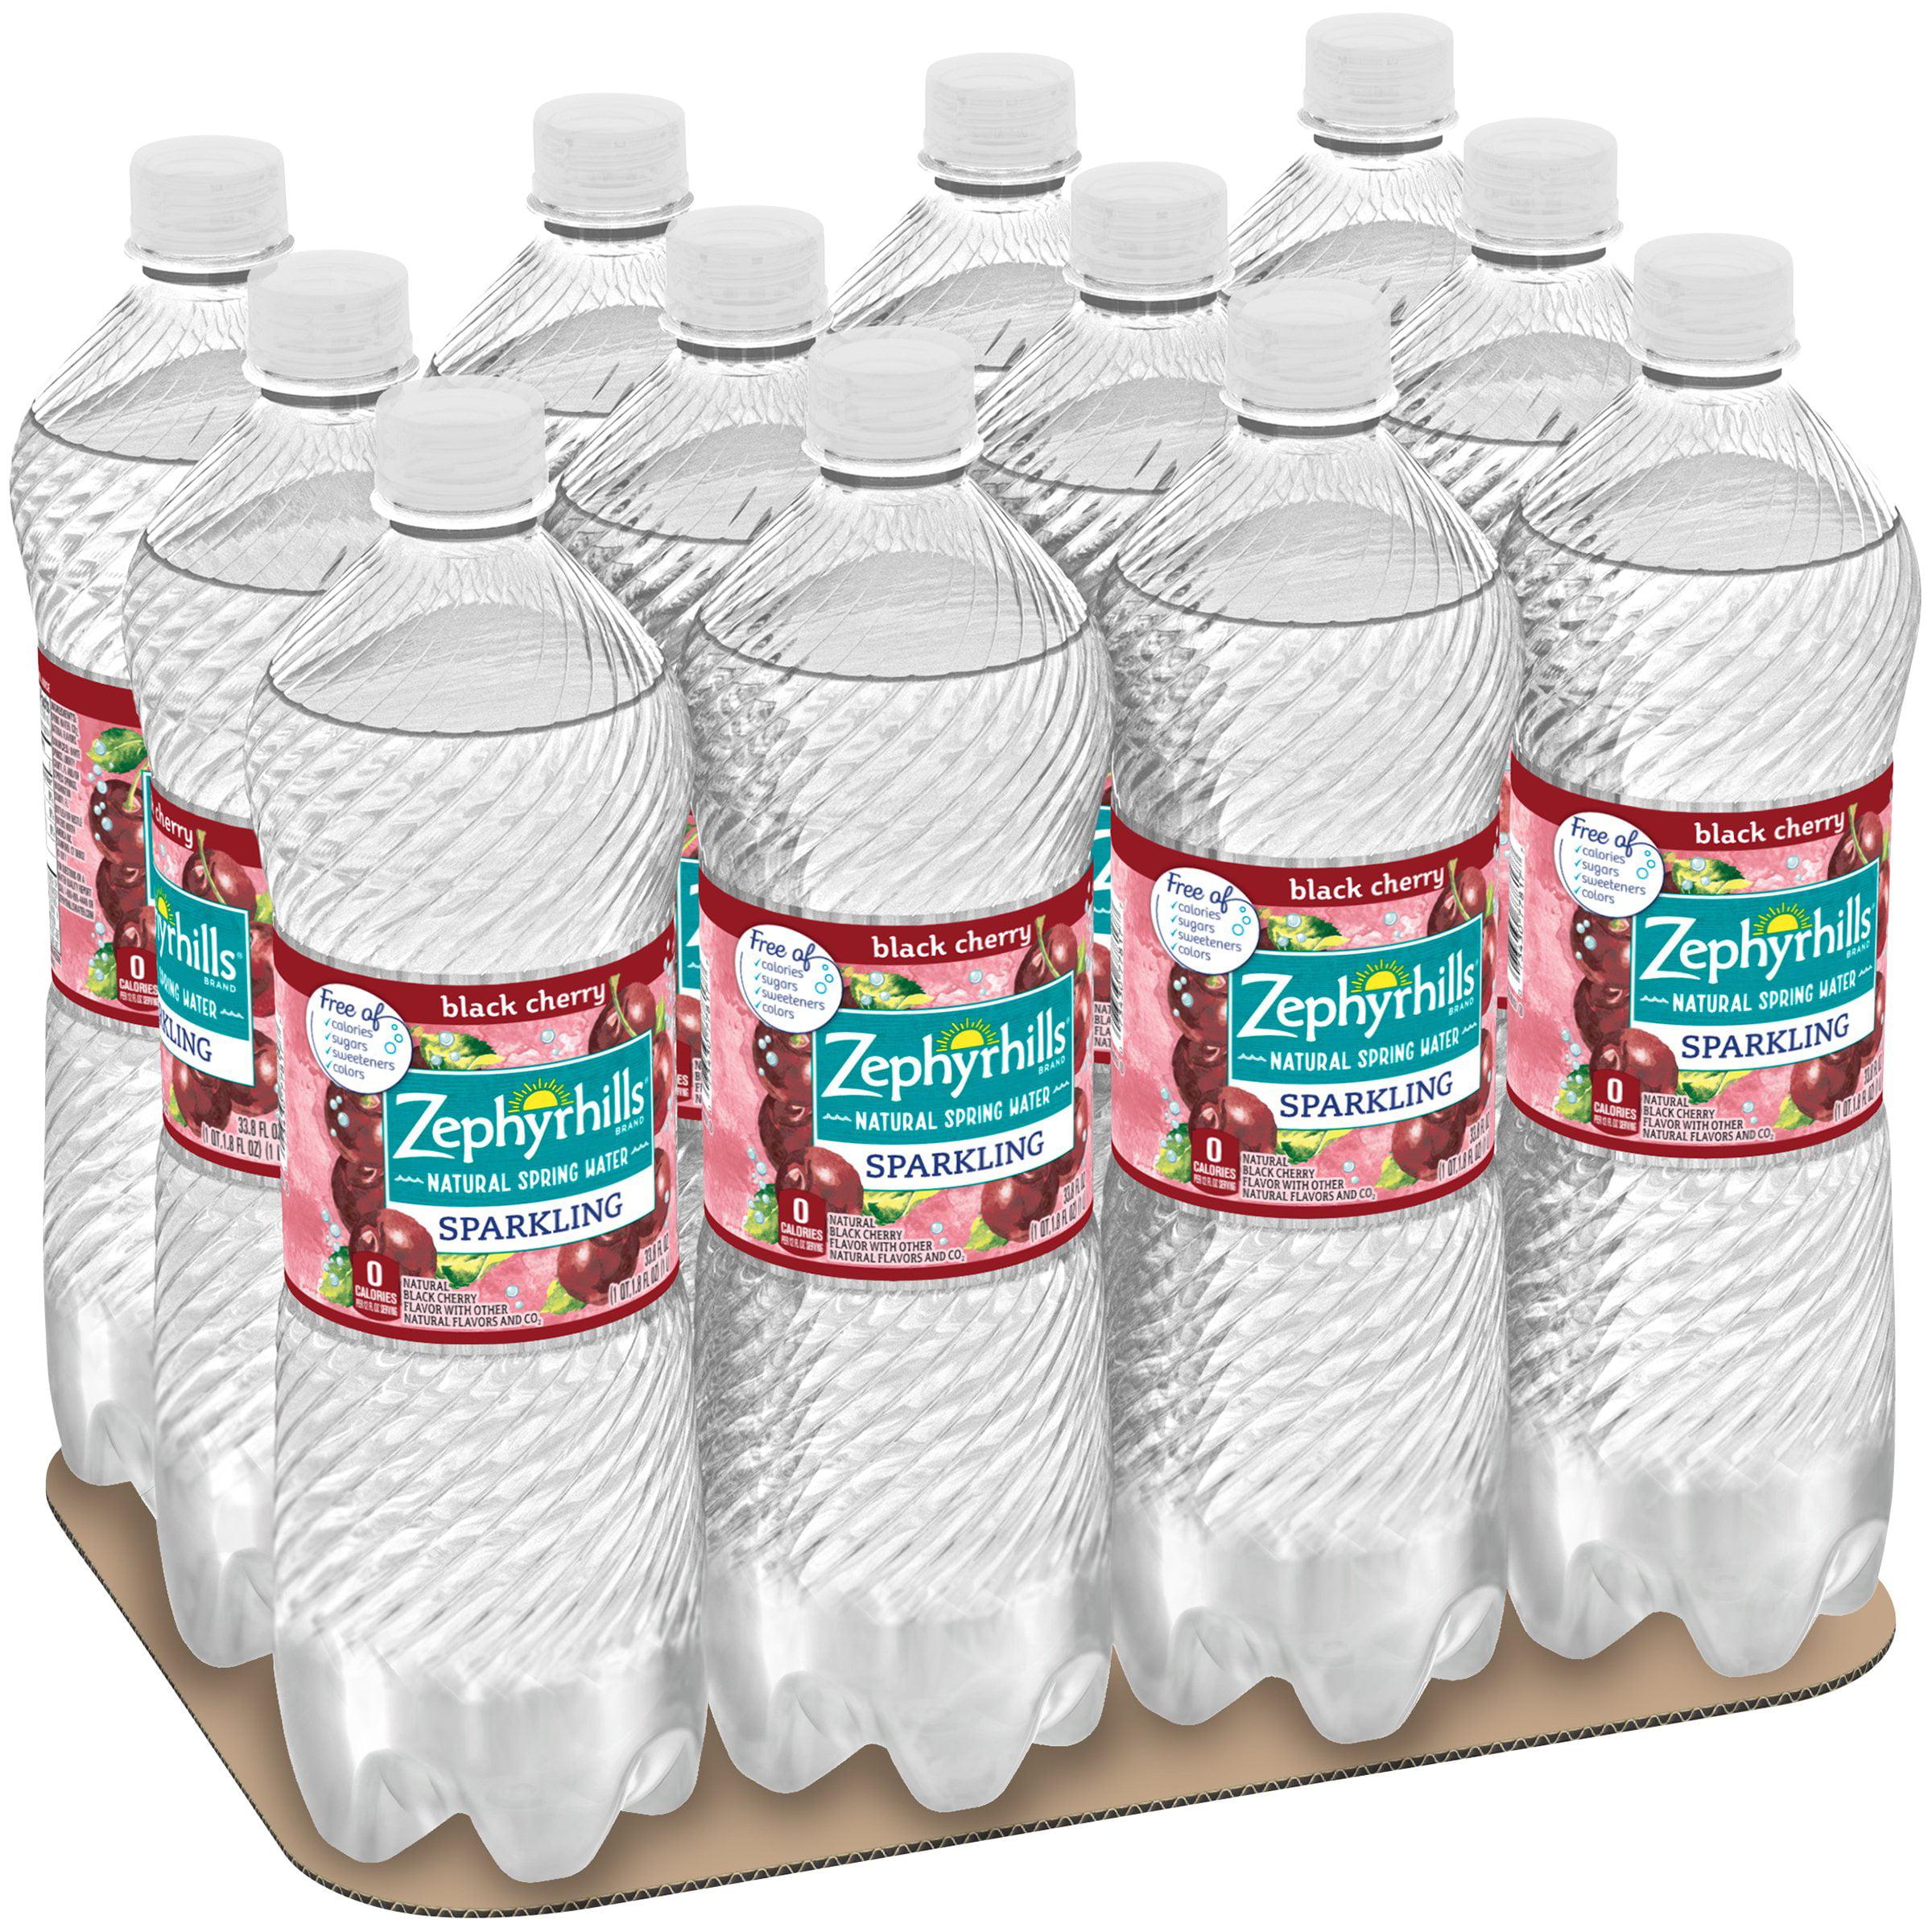 Zephyrhills Sports Bottle: Zephyrhills Sparkling Water, Black Cherry, 33.8 Oz